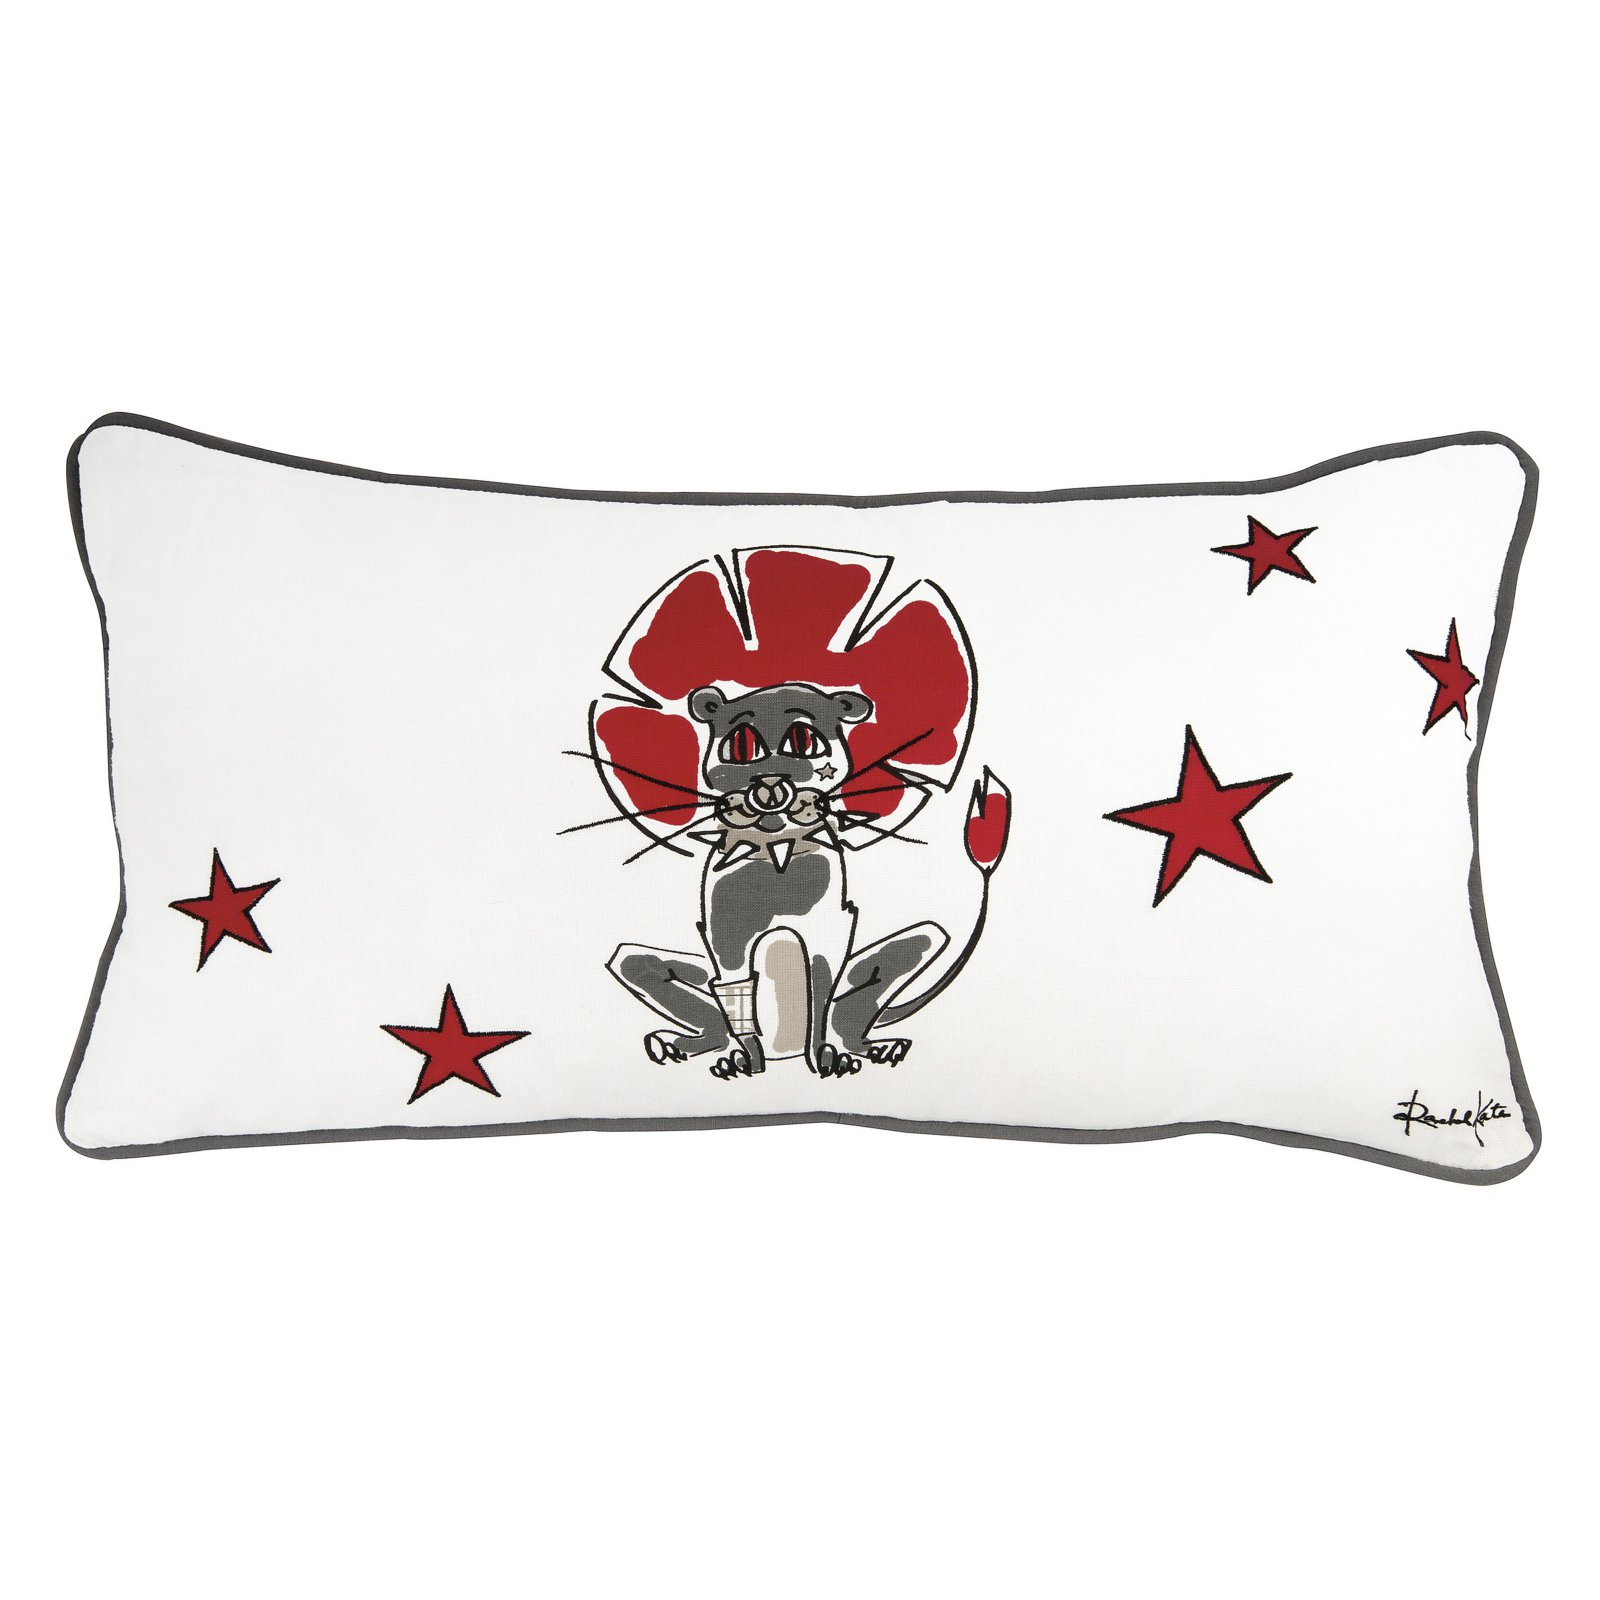 Rizzy Home Rachel Kate License Product Zebra Decorative Pillow White PILT06669WH001818